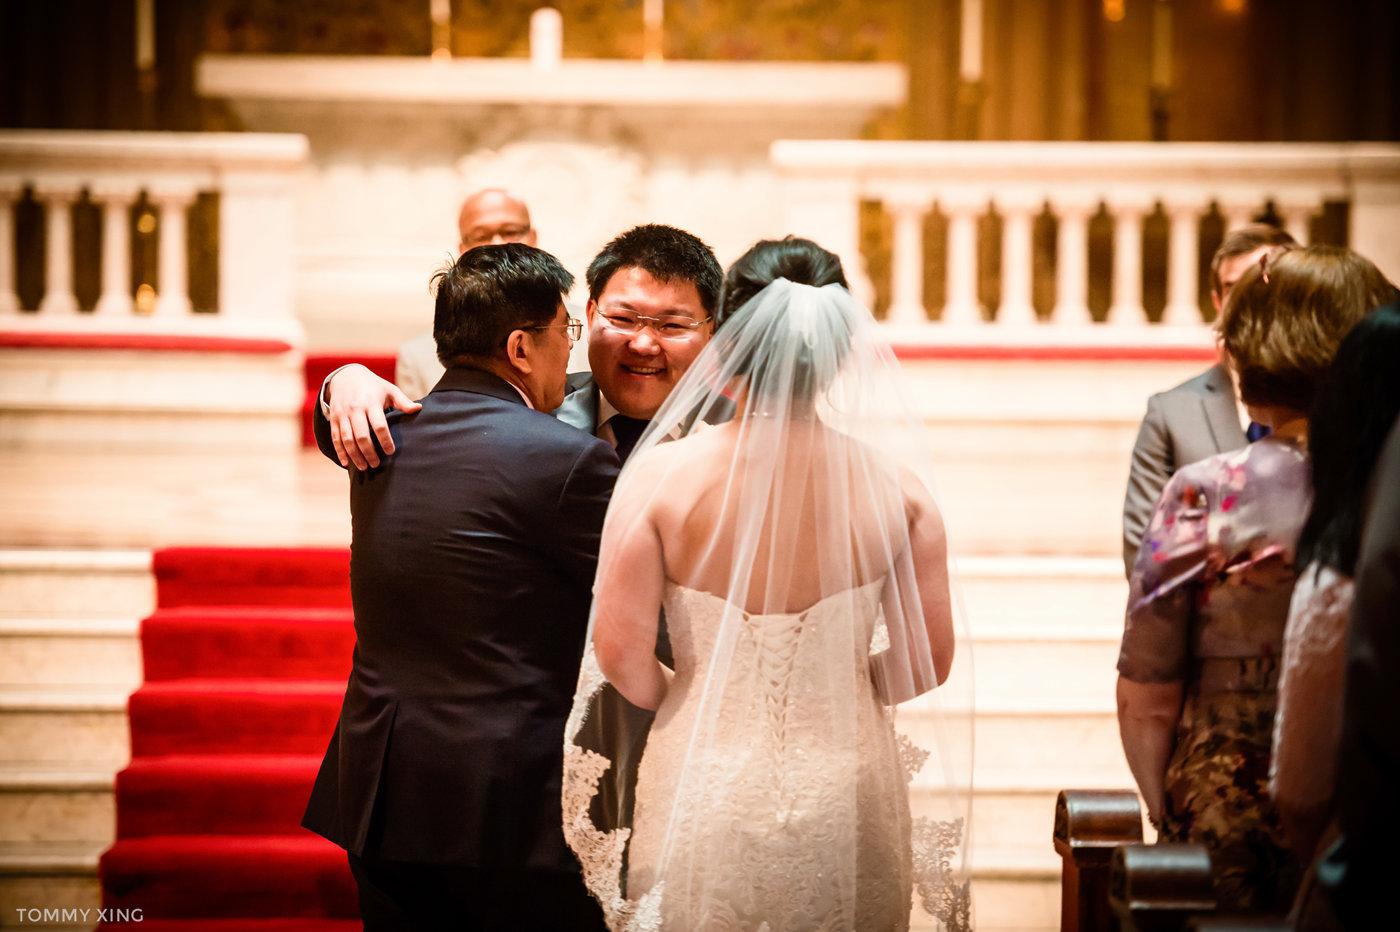 STANFORD MEMORIAL CHURCH WEDDING - Wenjie & Chengcheng - SAN FRANCISCO BAY AREA 斯坦福教堂婚礼跟拍 - 洛杉矶婚礼婚纱照摄影师 Tommy Xing Photography083.jpg